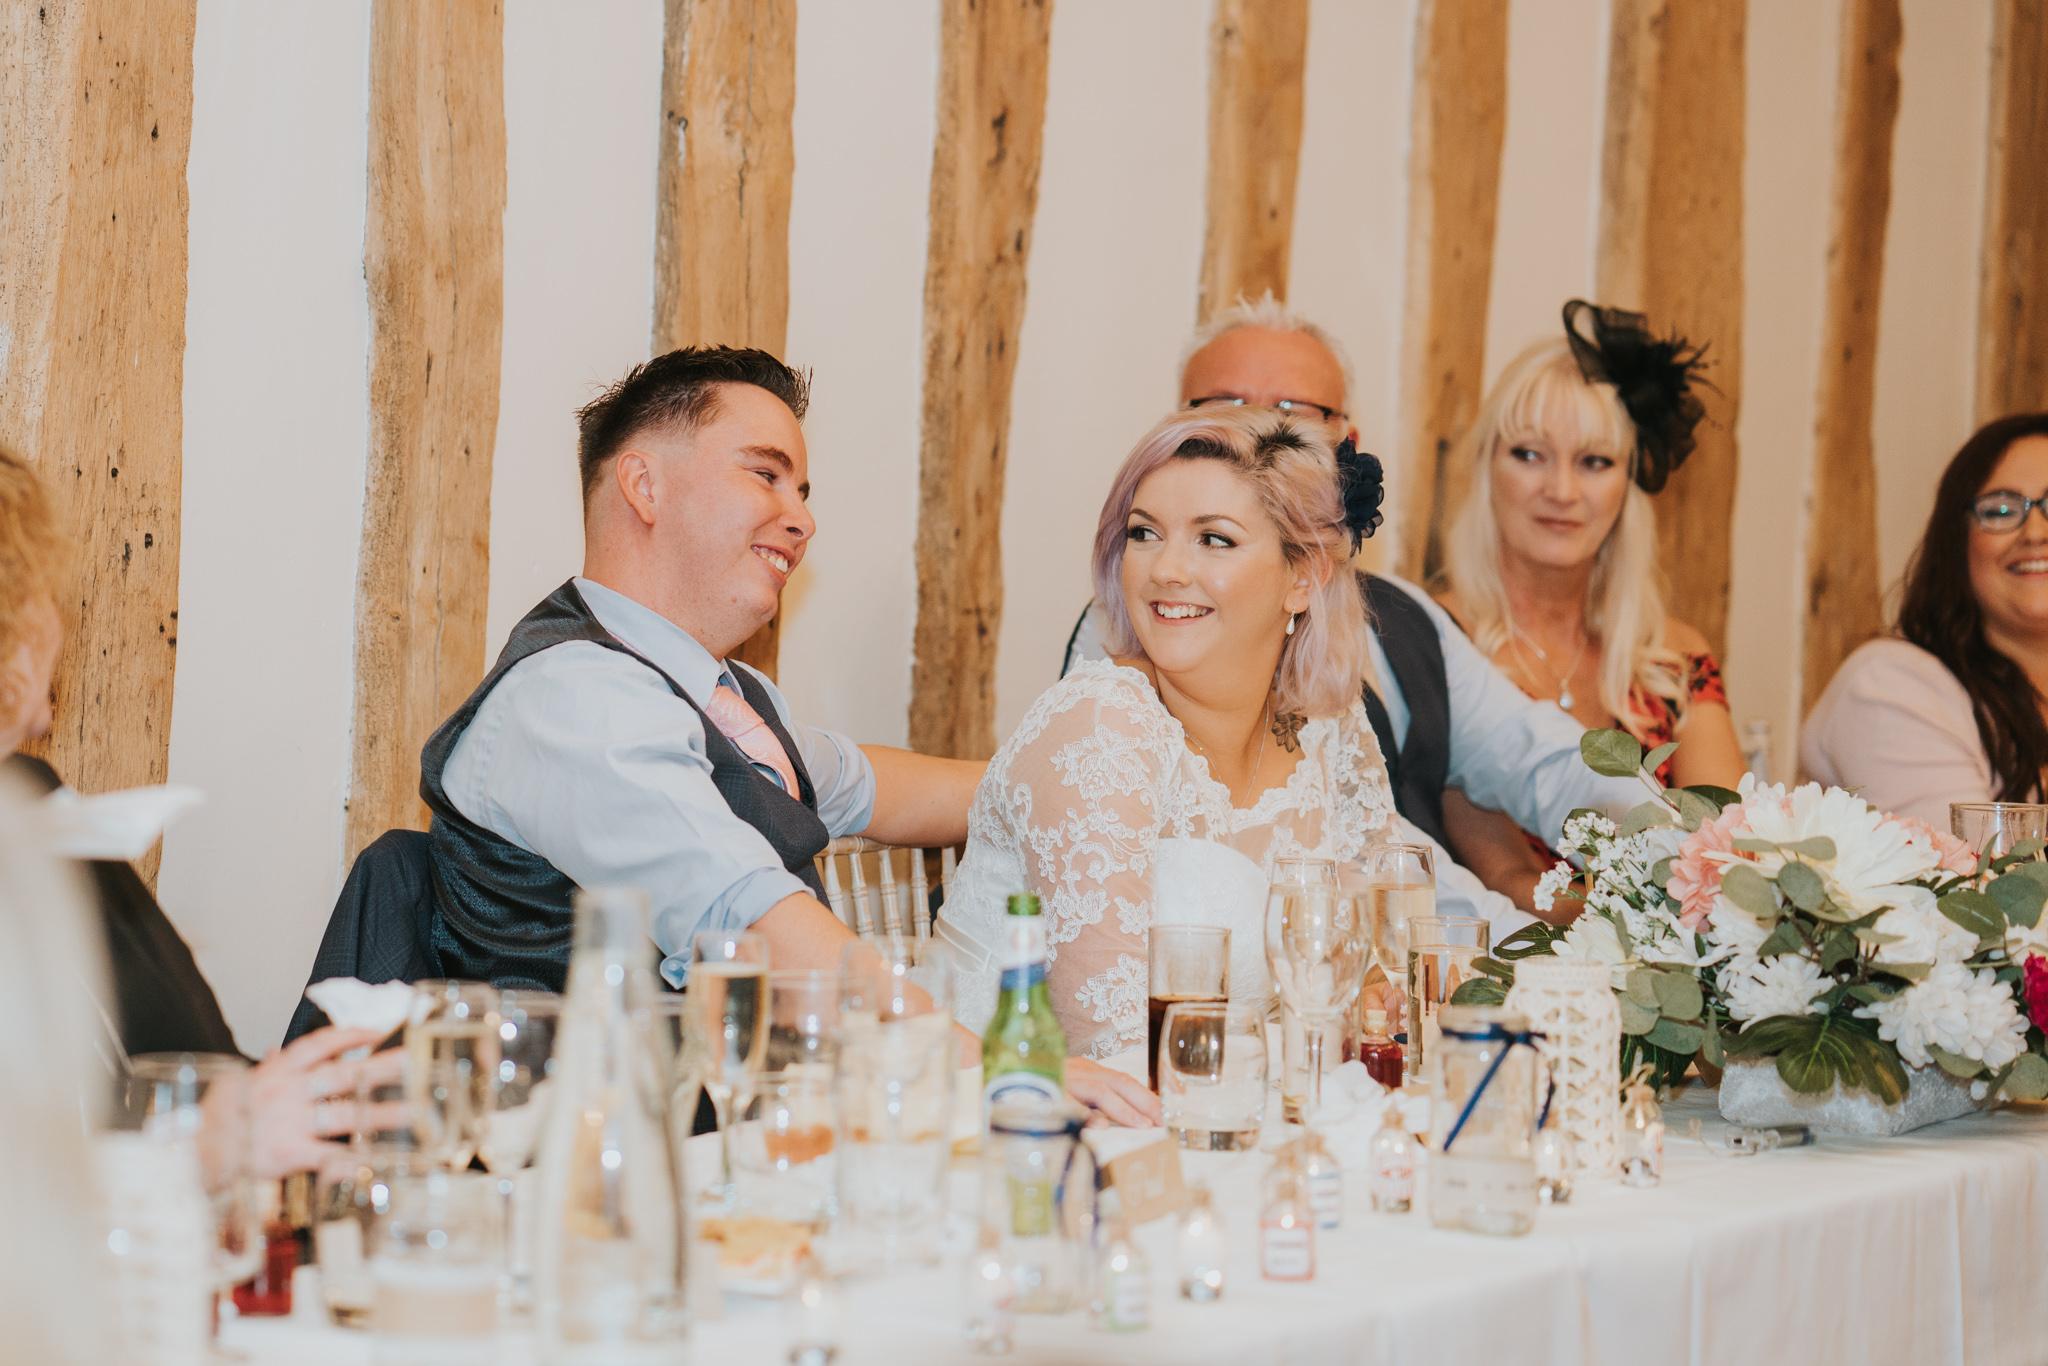 rhia-james-rustic-crabbs-barn-vintage-50s-retro-wedding-grace-elizabeth-colchester-essex-alternative-relaxed-wedding-family-photography-devon-suffolk-norfolk-essex (126 of 138).jpg